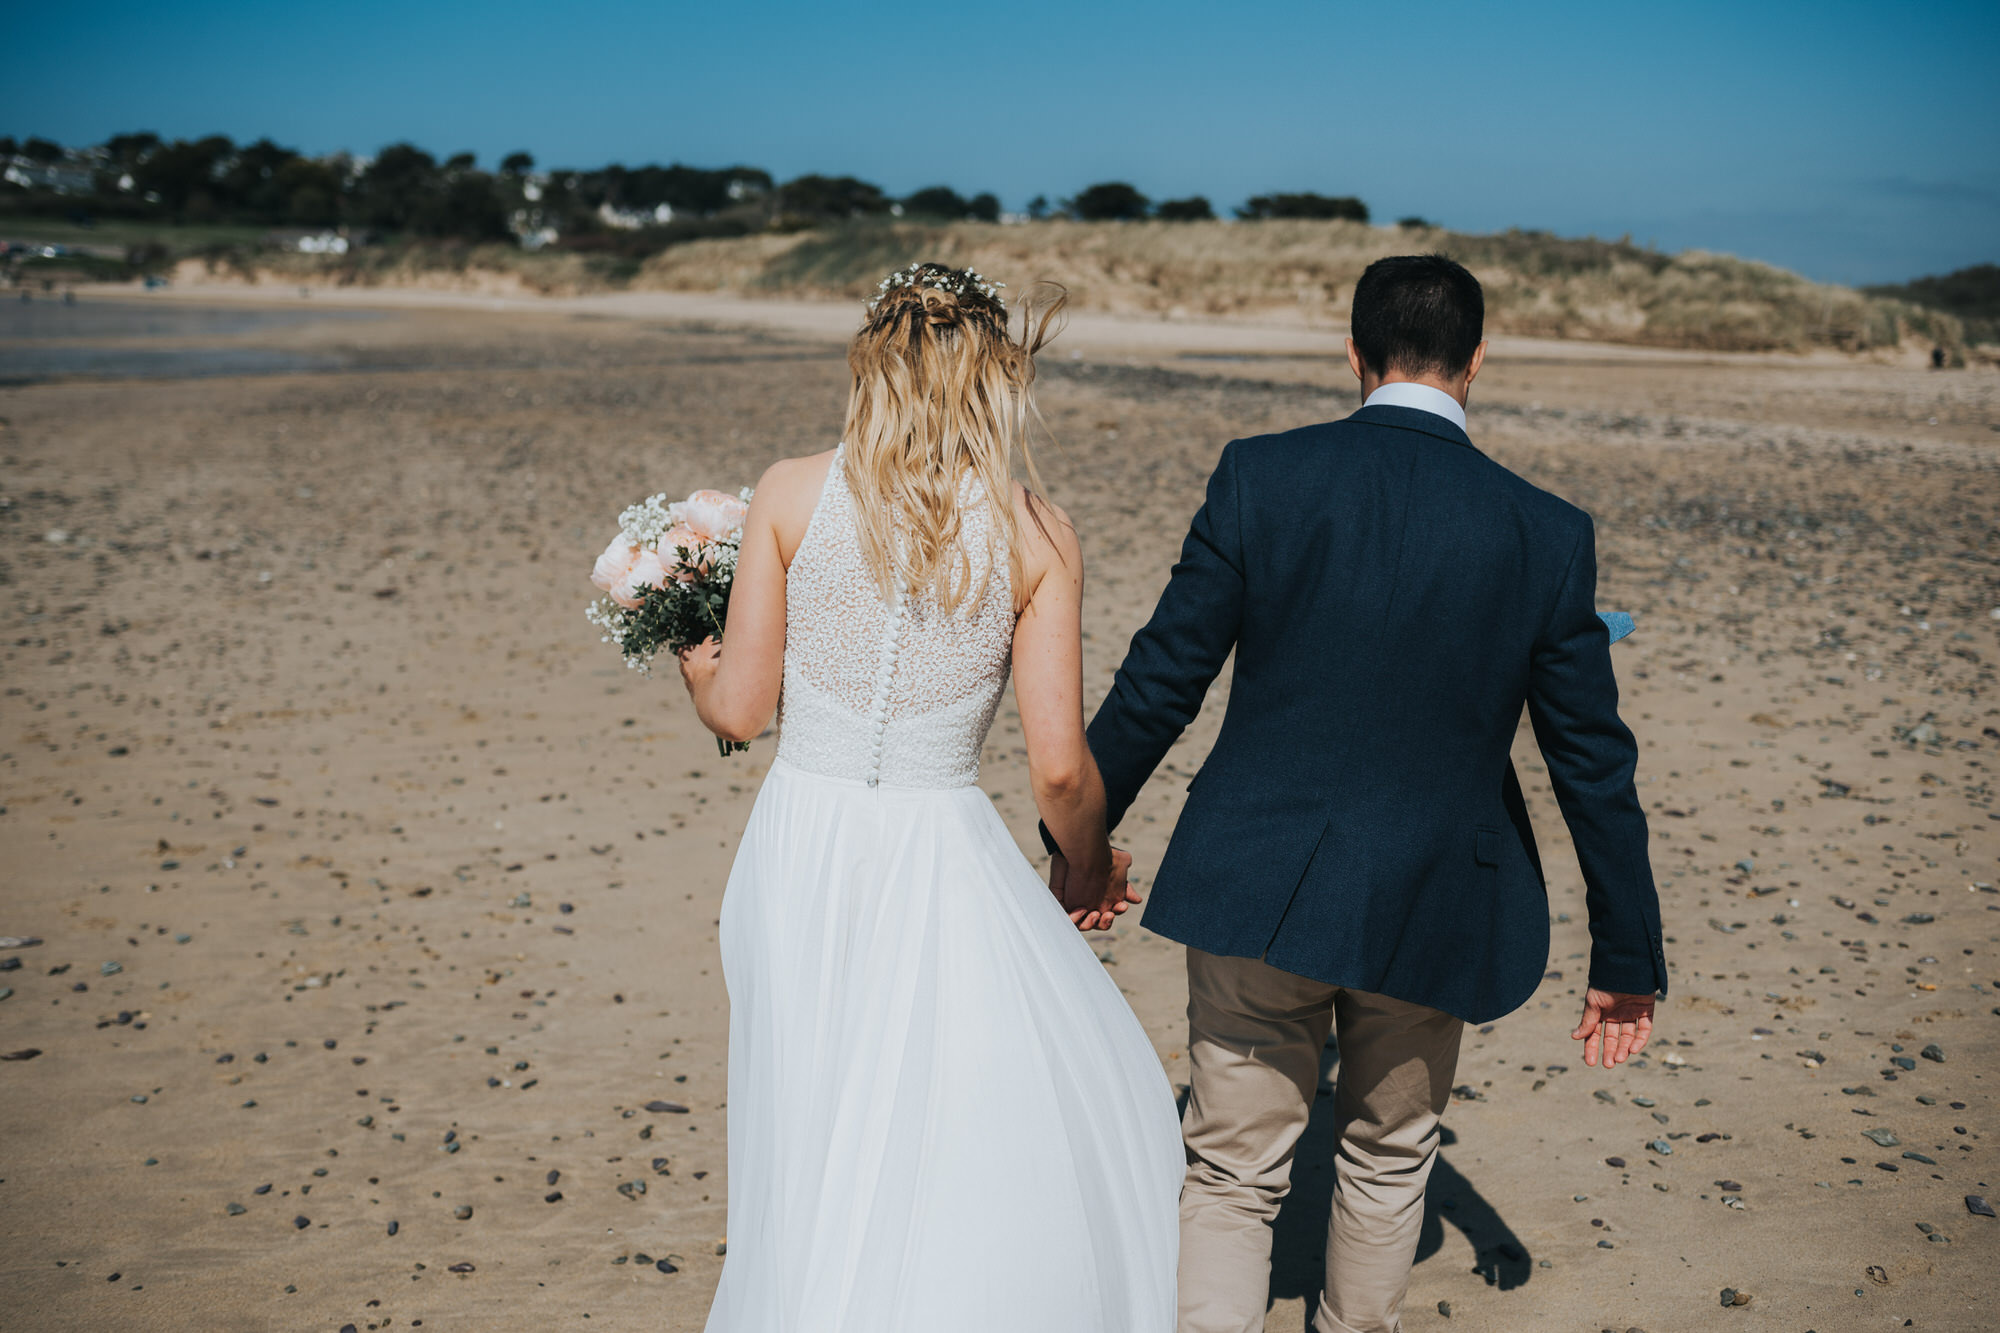 Clifton brides wedding dress jo